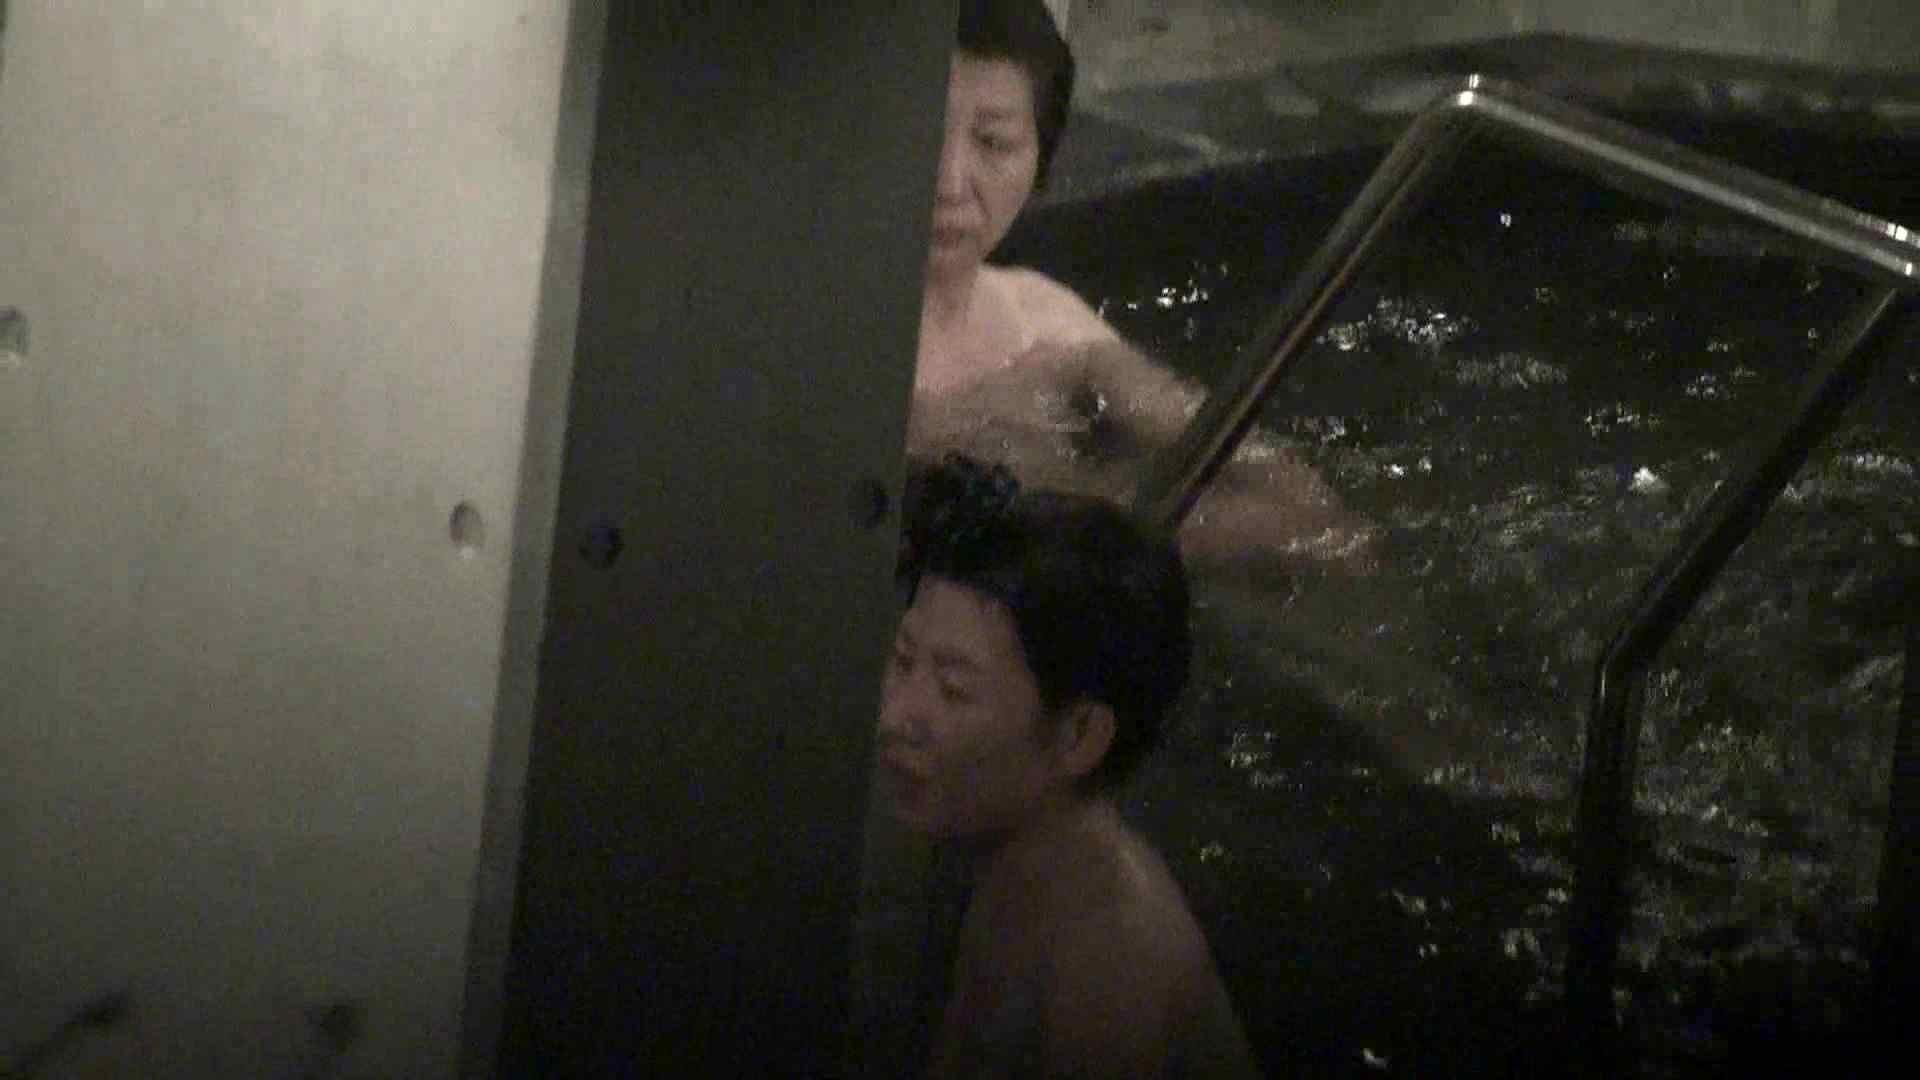 Aquaな露天風呂Vol.398 盗撮  59連発 57